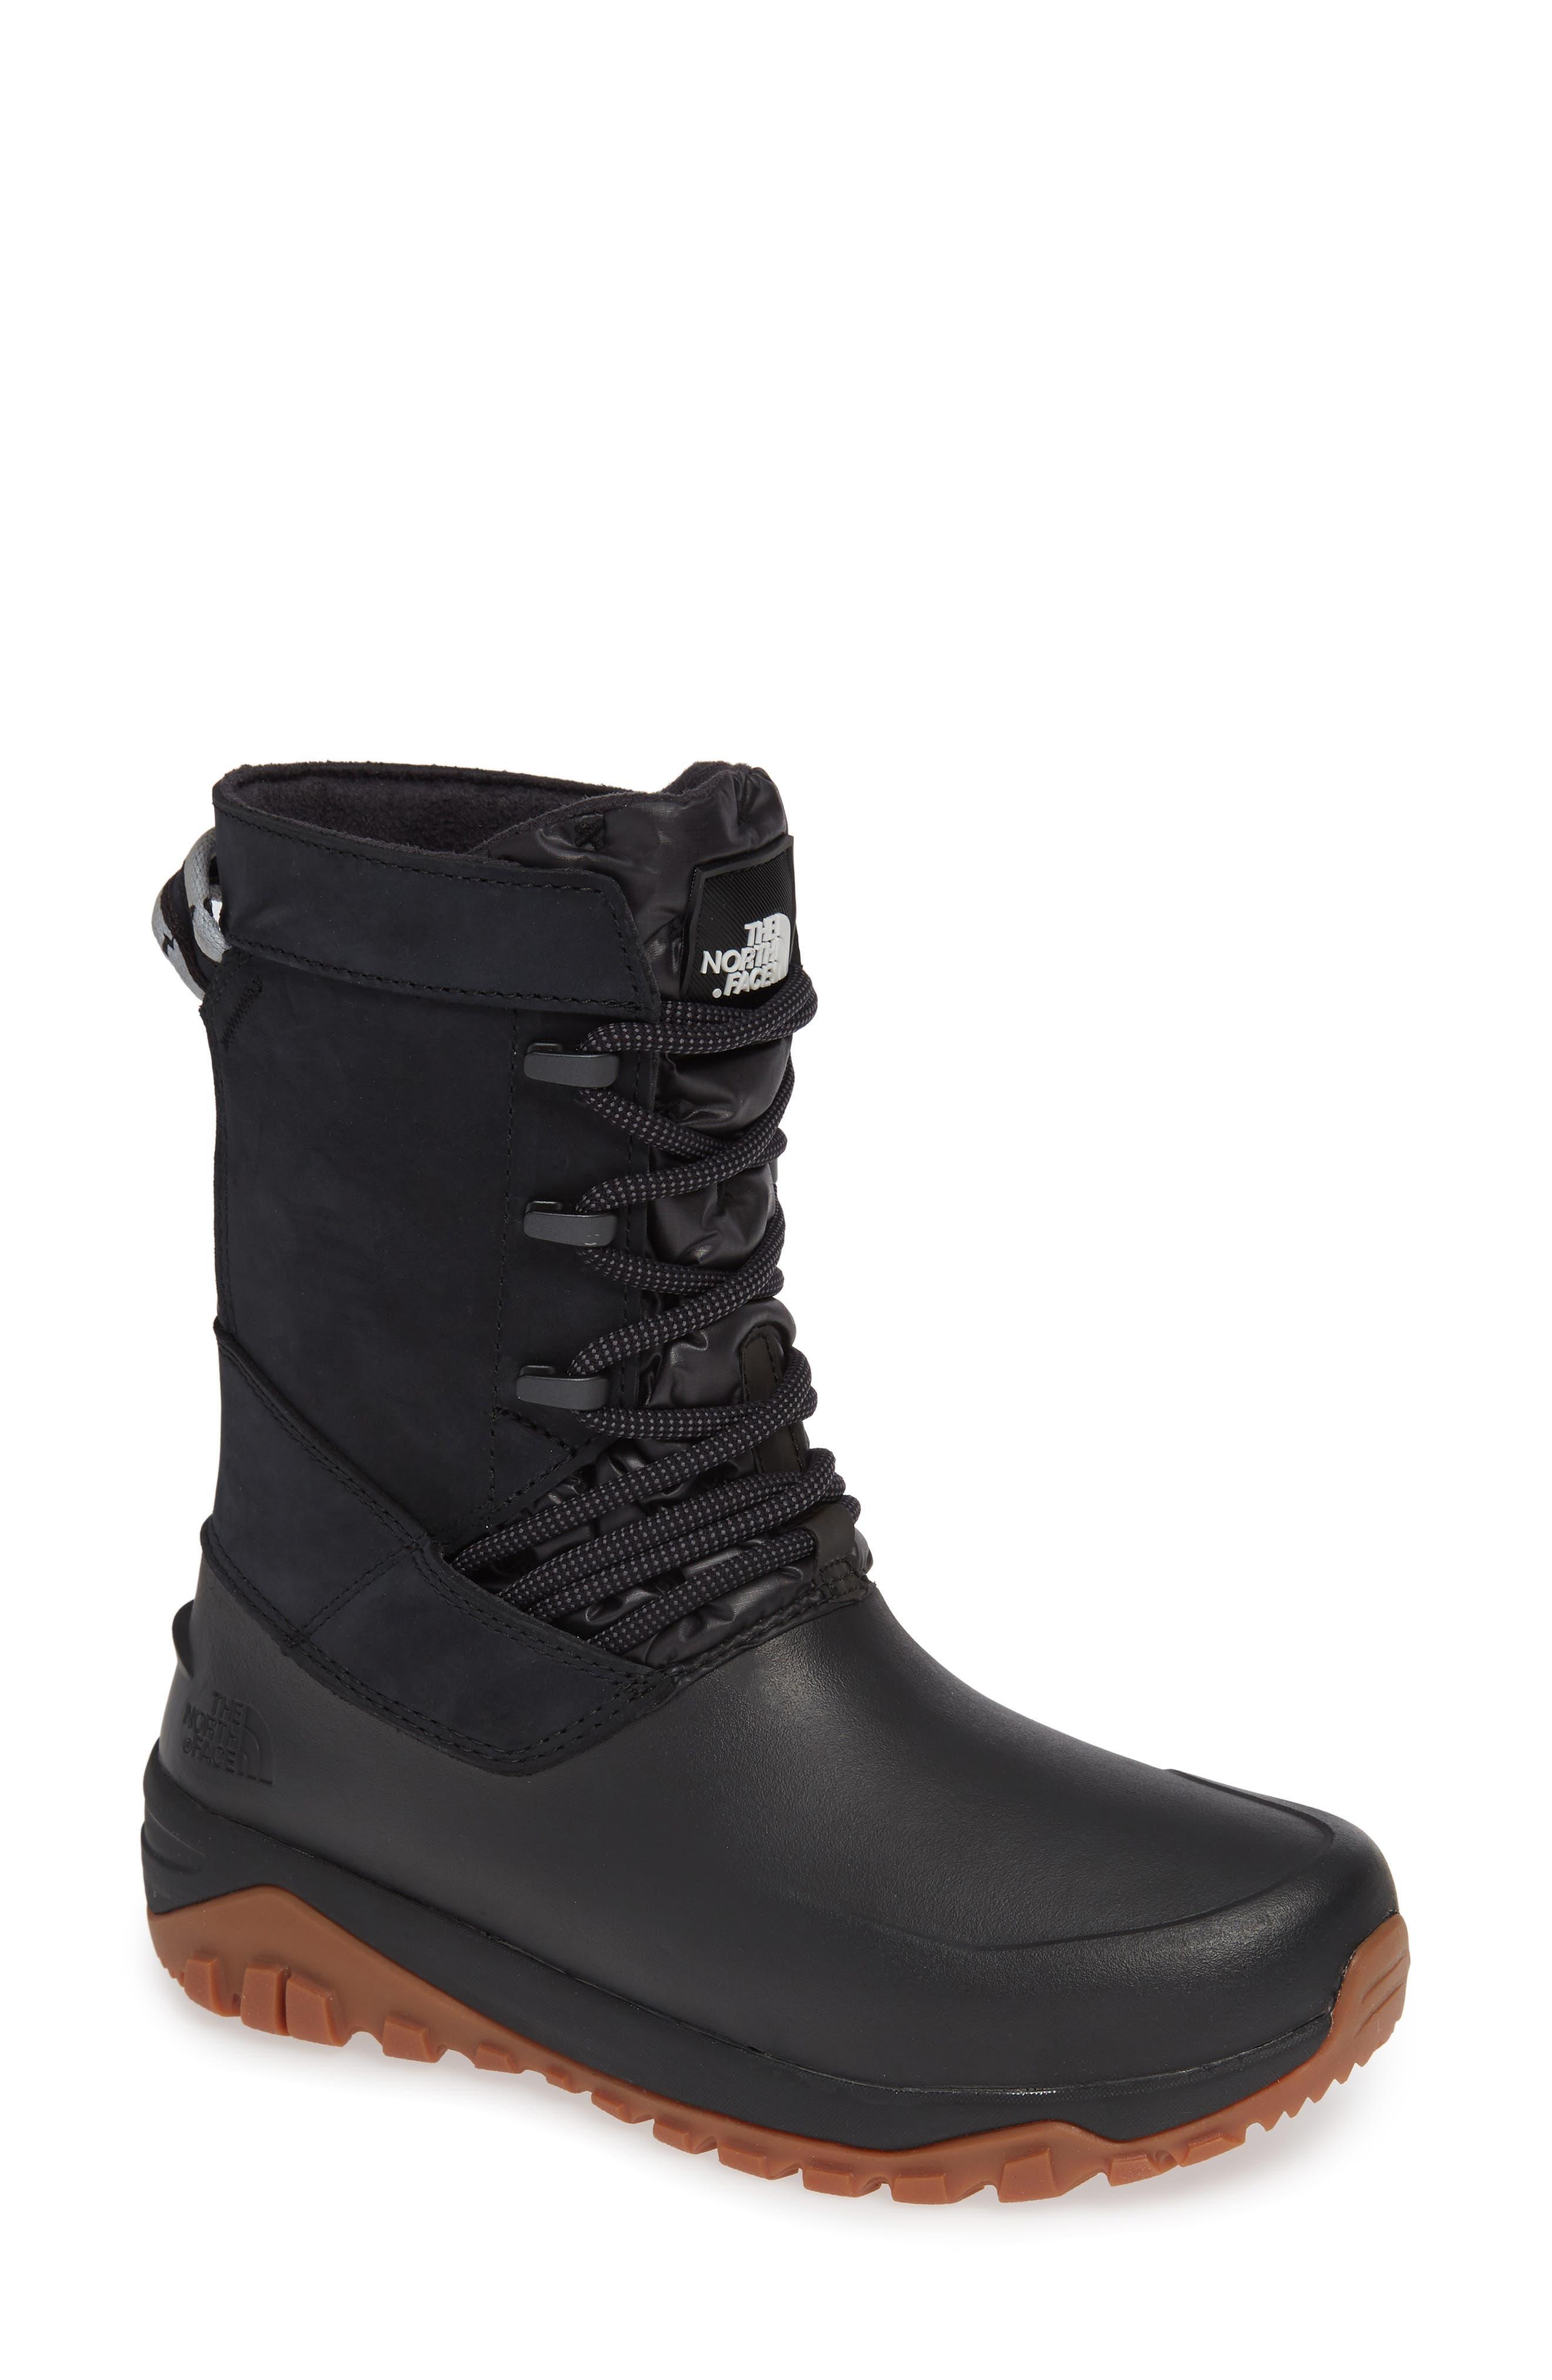 The North Face Yukiona Waterproof Winter Boot, Black